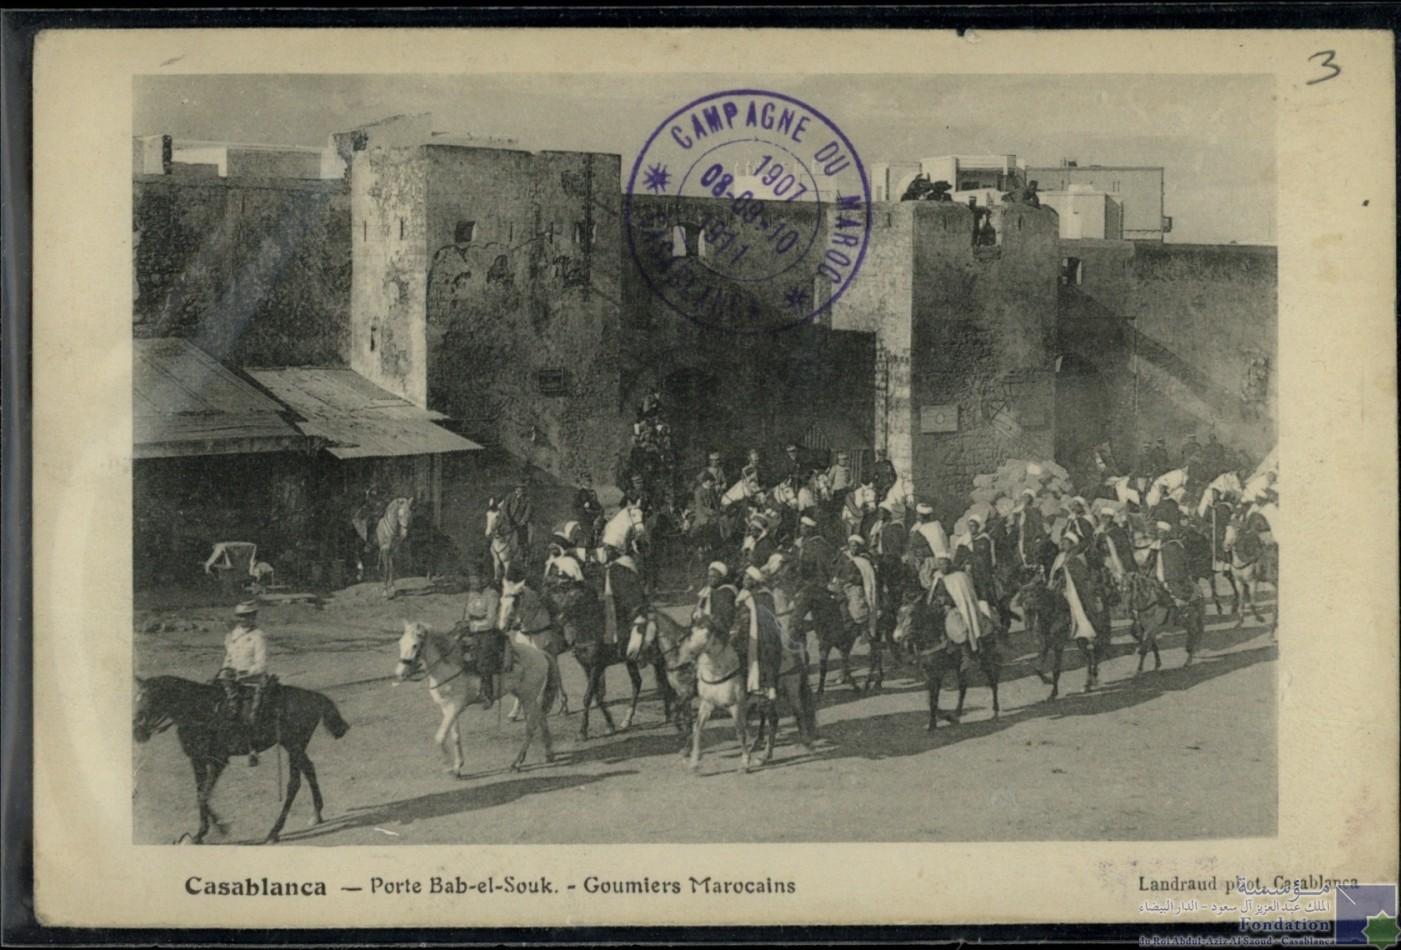 Casablanca  Porte Bab El Souk Goumiers Marocains